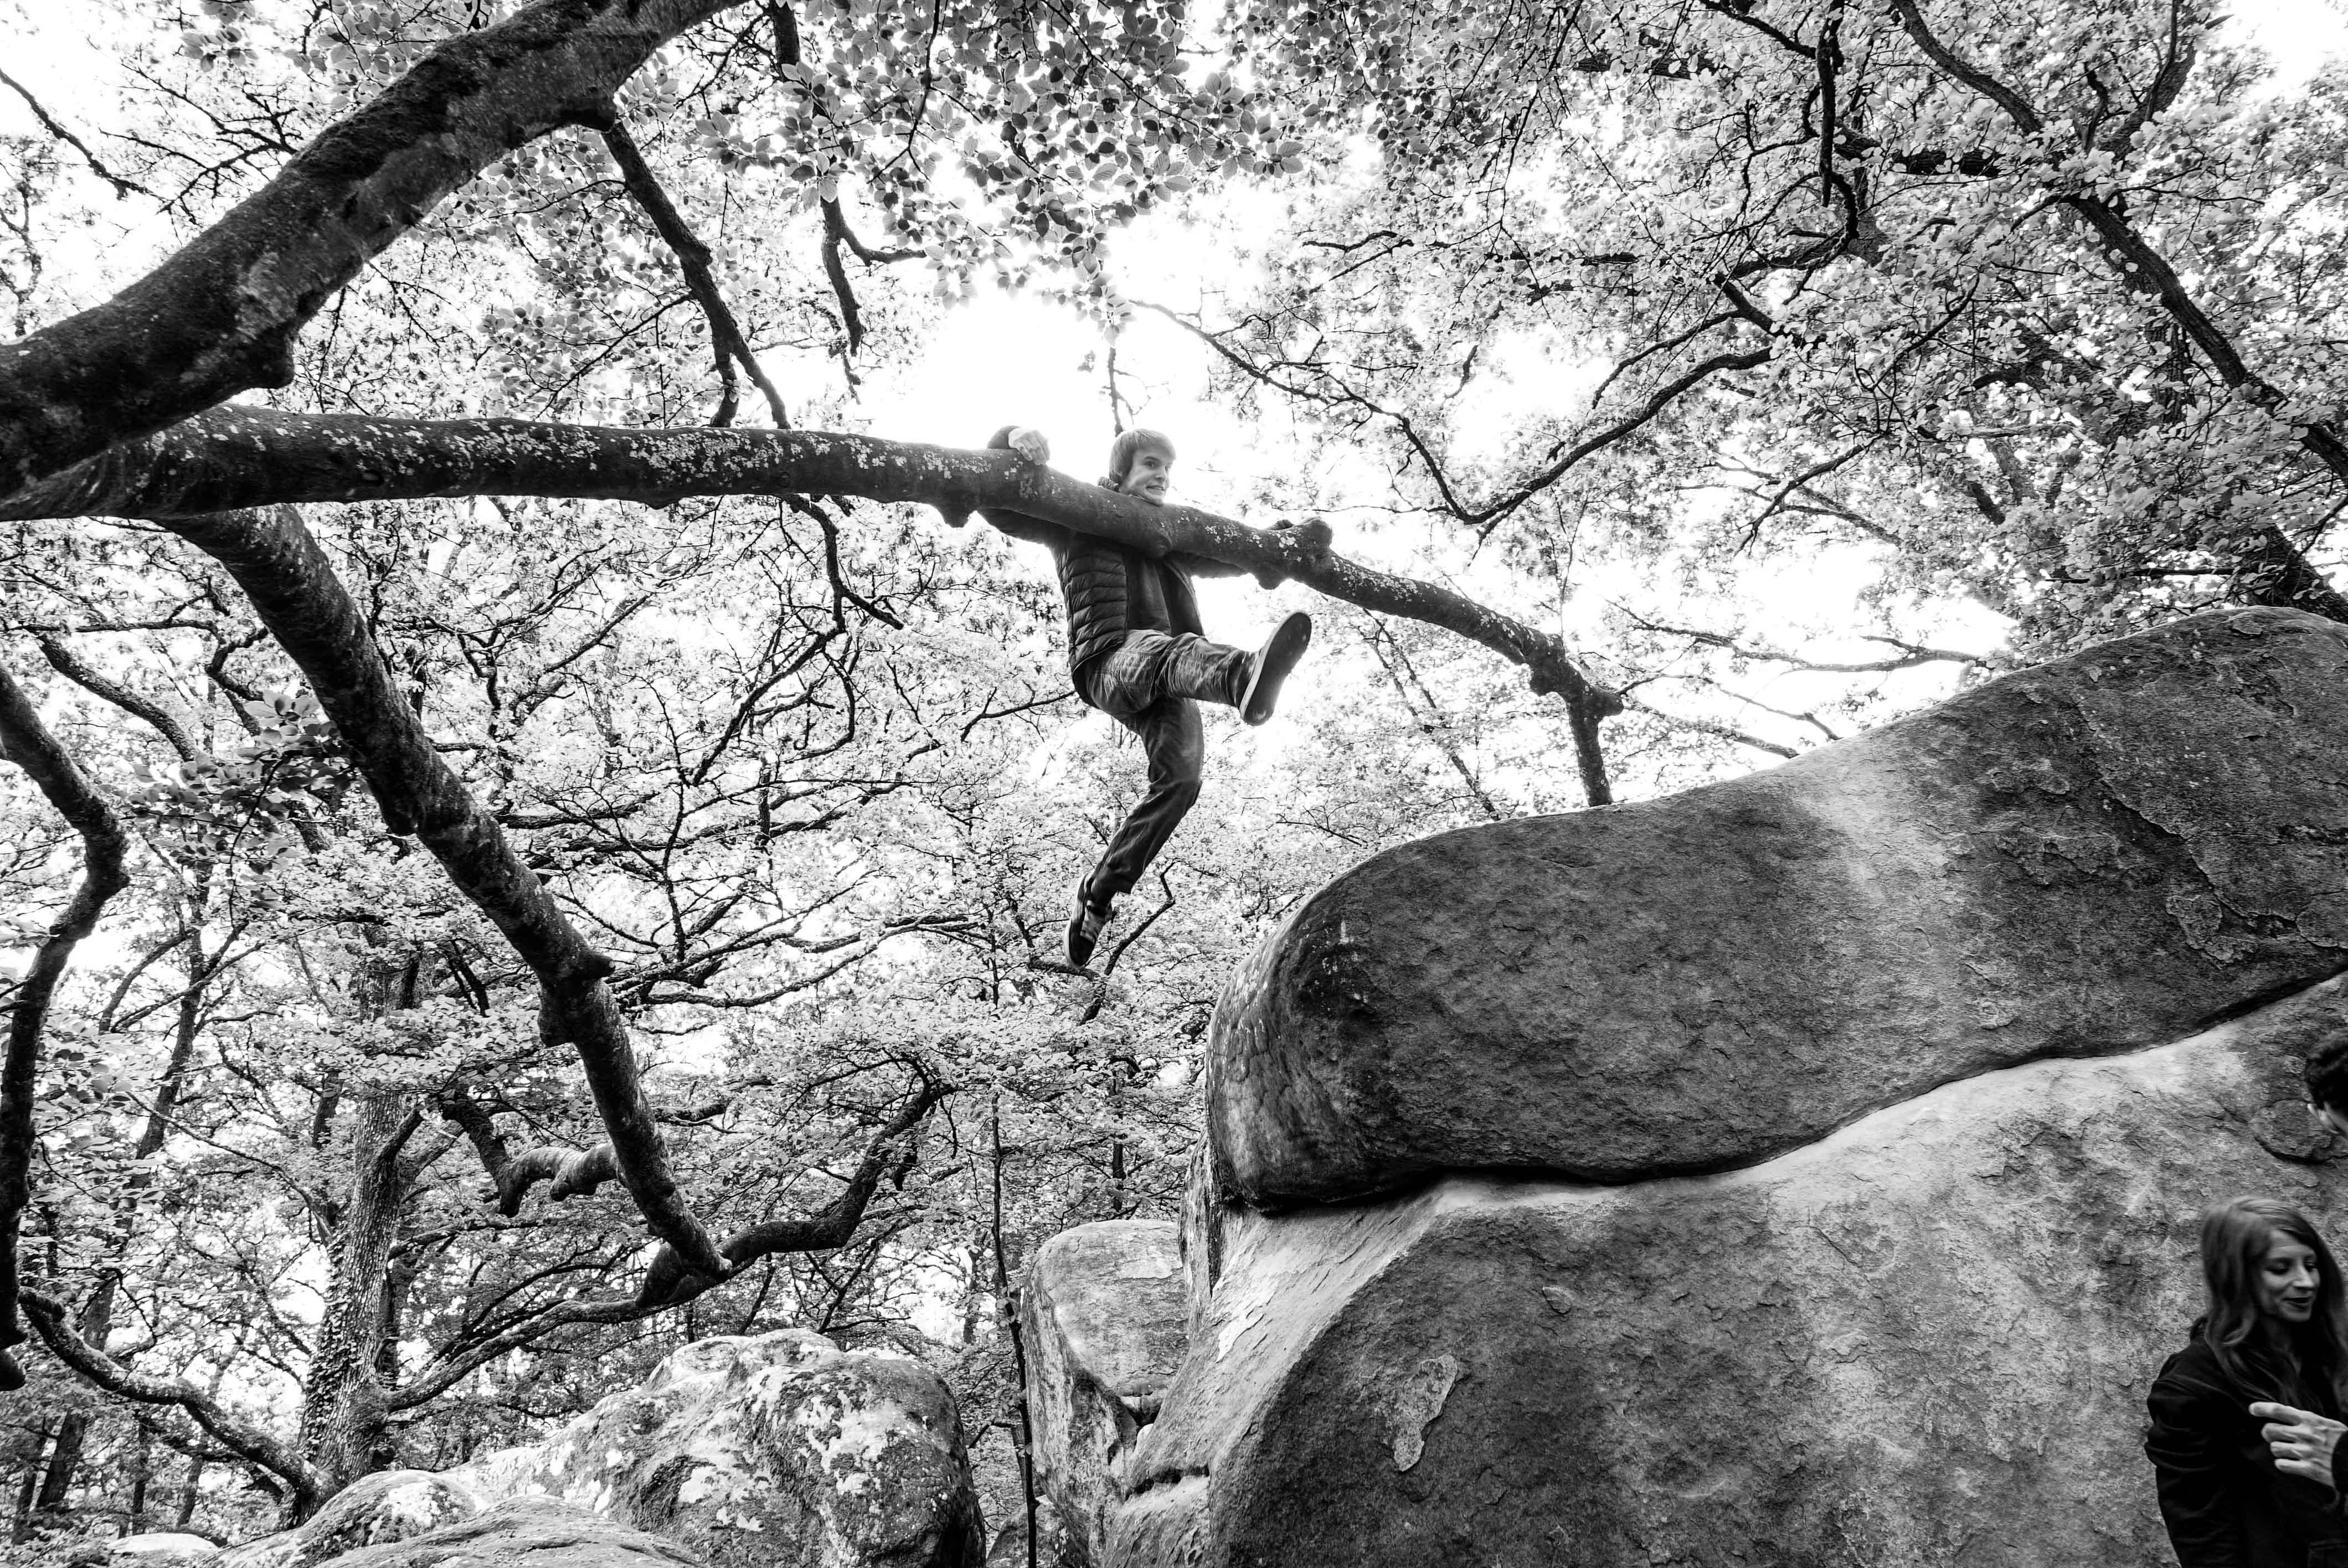 fontainbleau climbing 2016 mike brindley-109